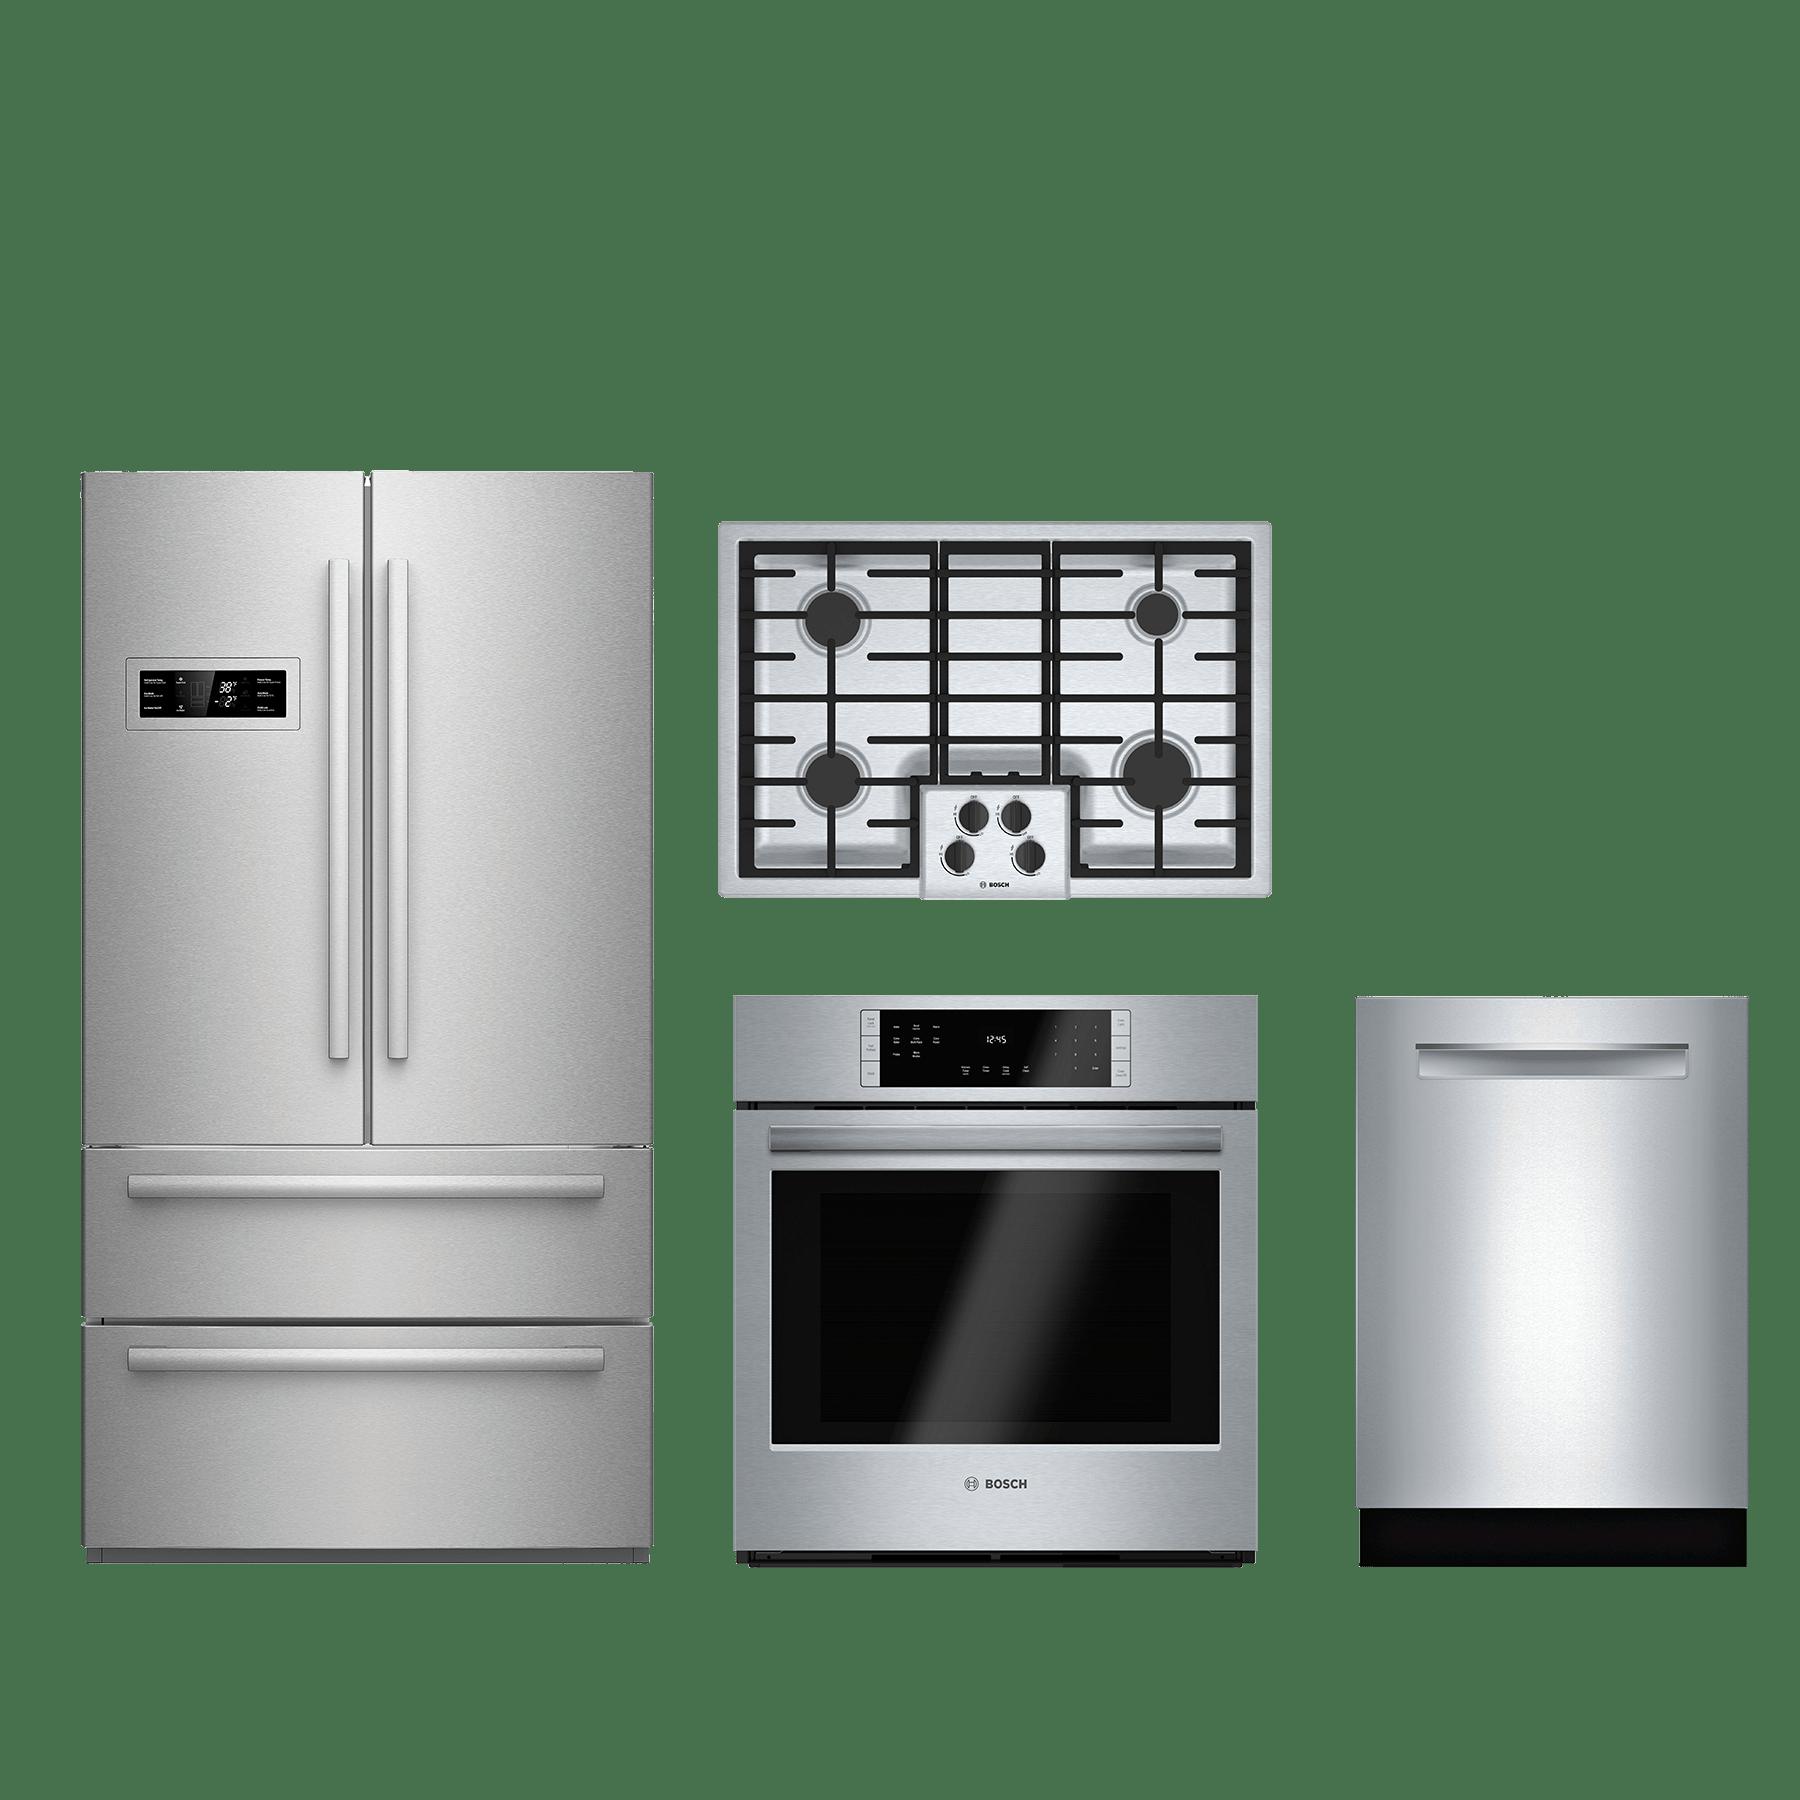 bosch 4 piece kitchen package stainless steel kitchen appliance packages  rh   donsappliances com